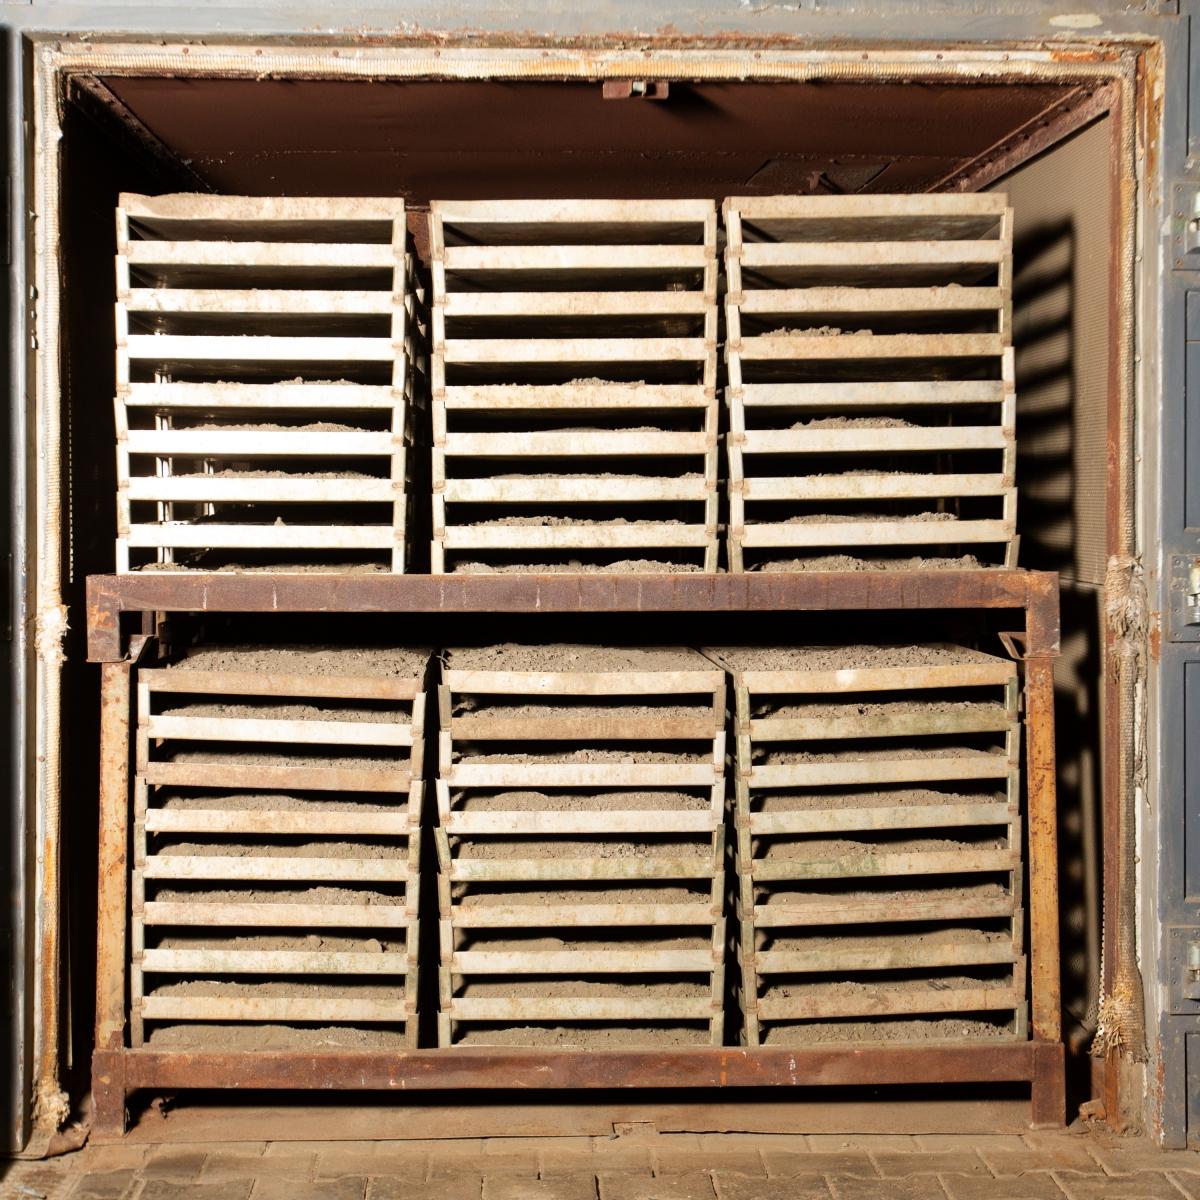 mairec edelmetall precious metals recycling gekraetz konzentrate sweeps concentrates trocknung ofen maschine dry oven